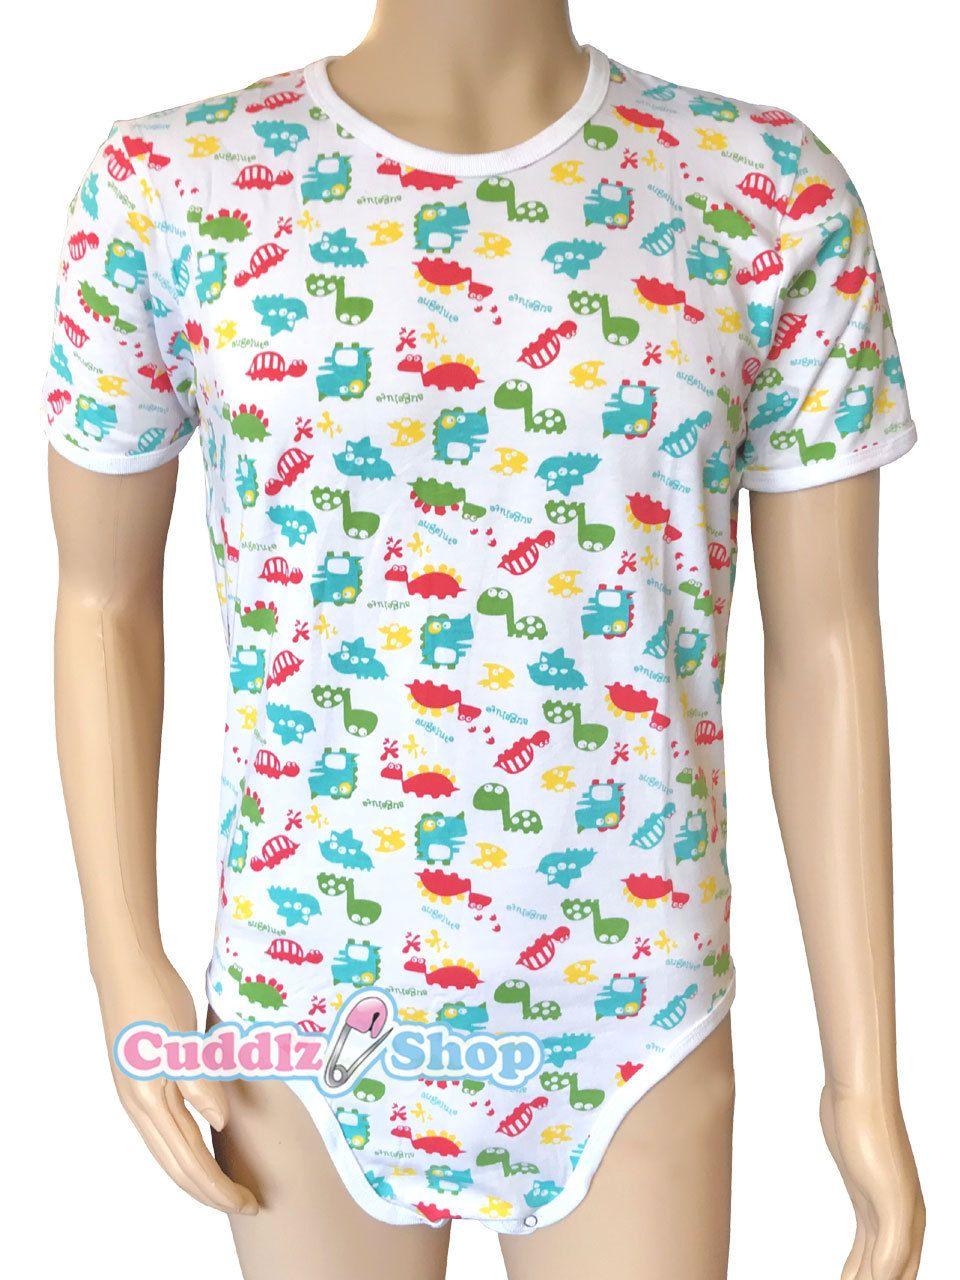 ead1eba9225 Cuddlz Colourful Dinosaur Animal Pattern Stretch Cotton onesie for adults  ABDL Adult Baby Body Suit